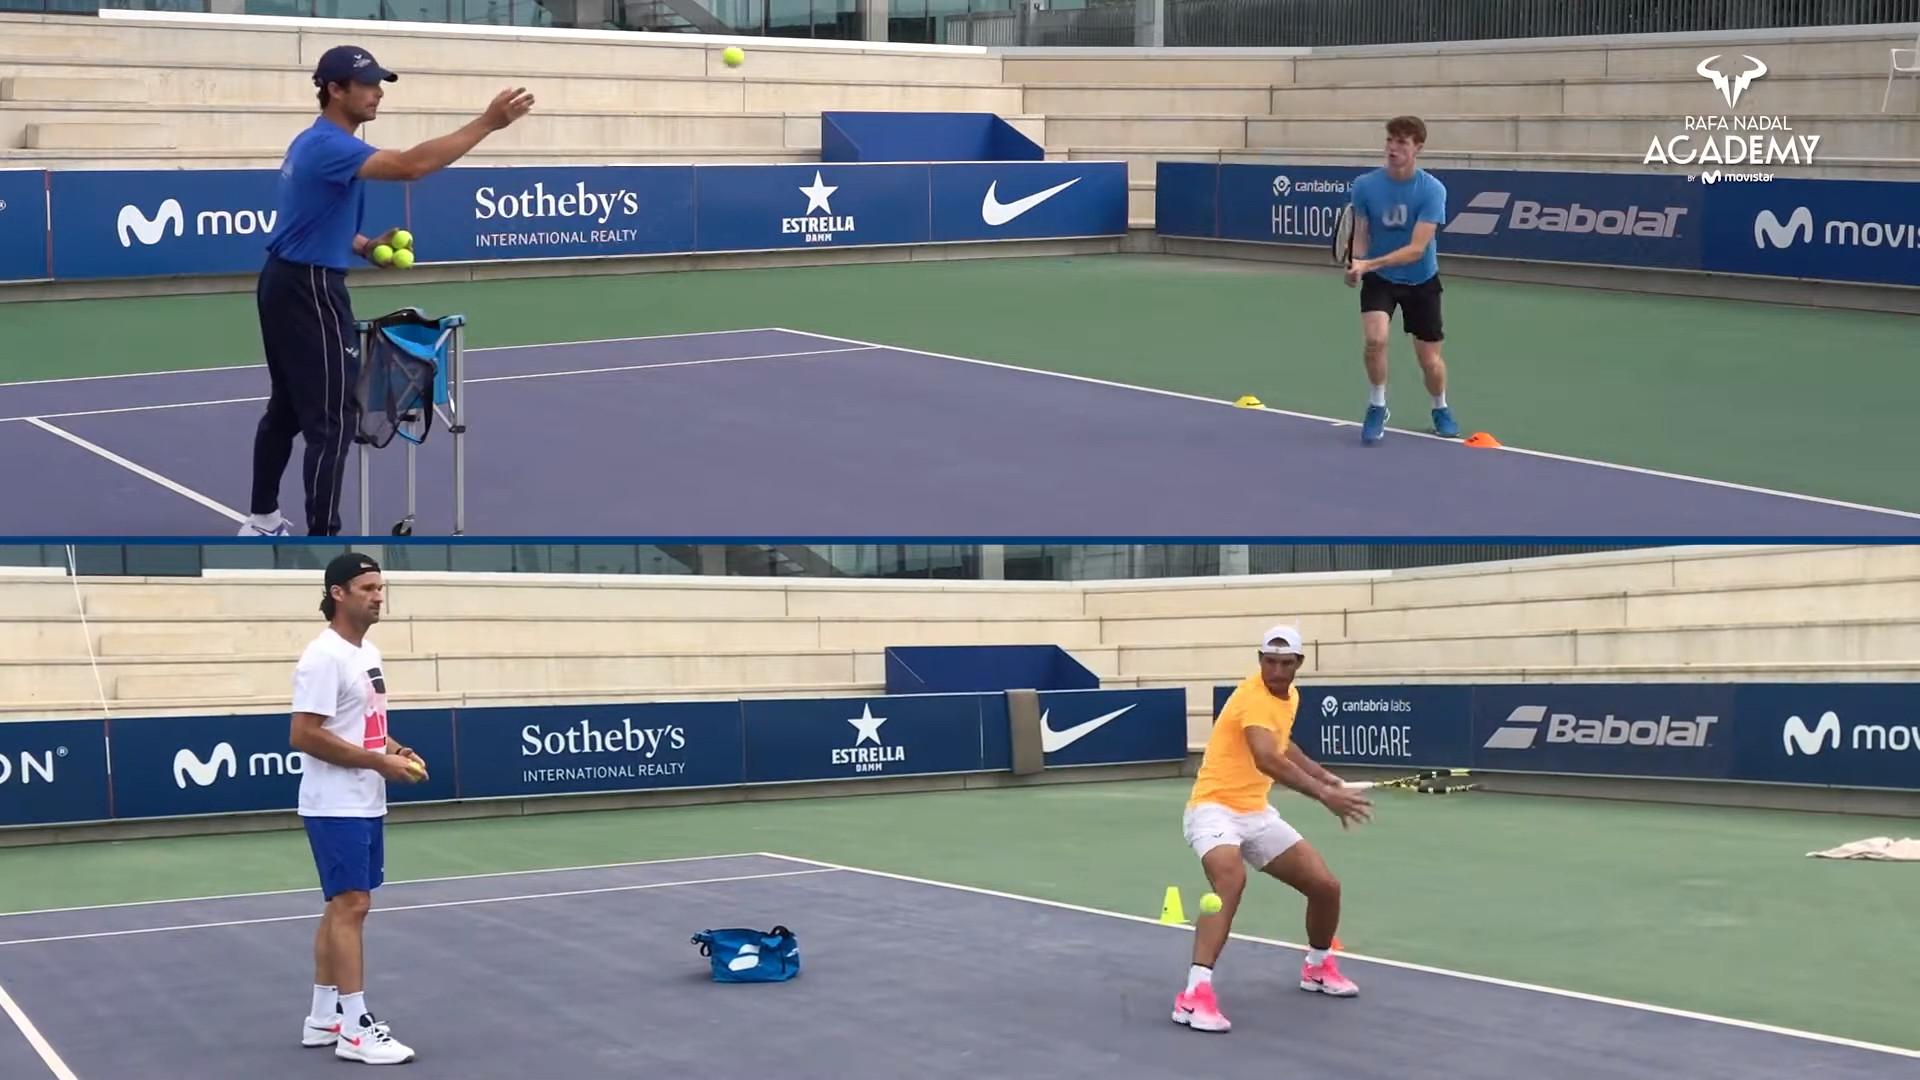 Rafa Nadal Academy The Tennis Methodology Made In Manacor